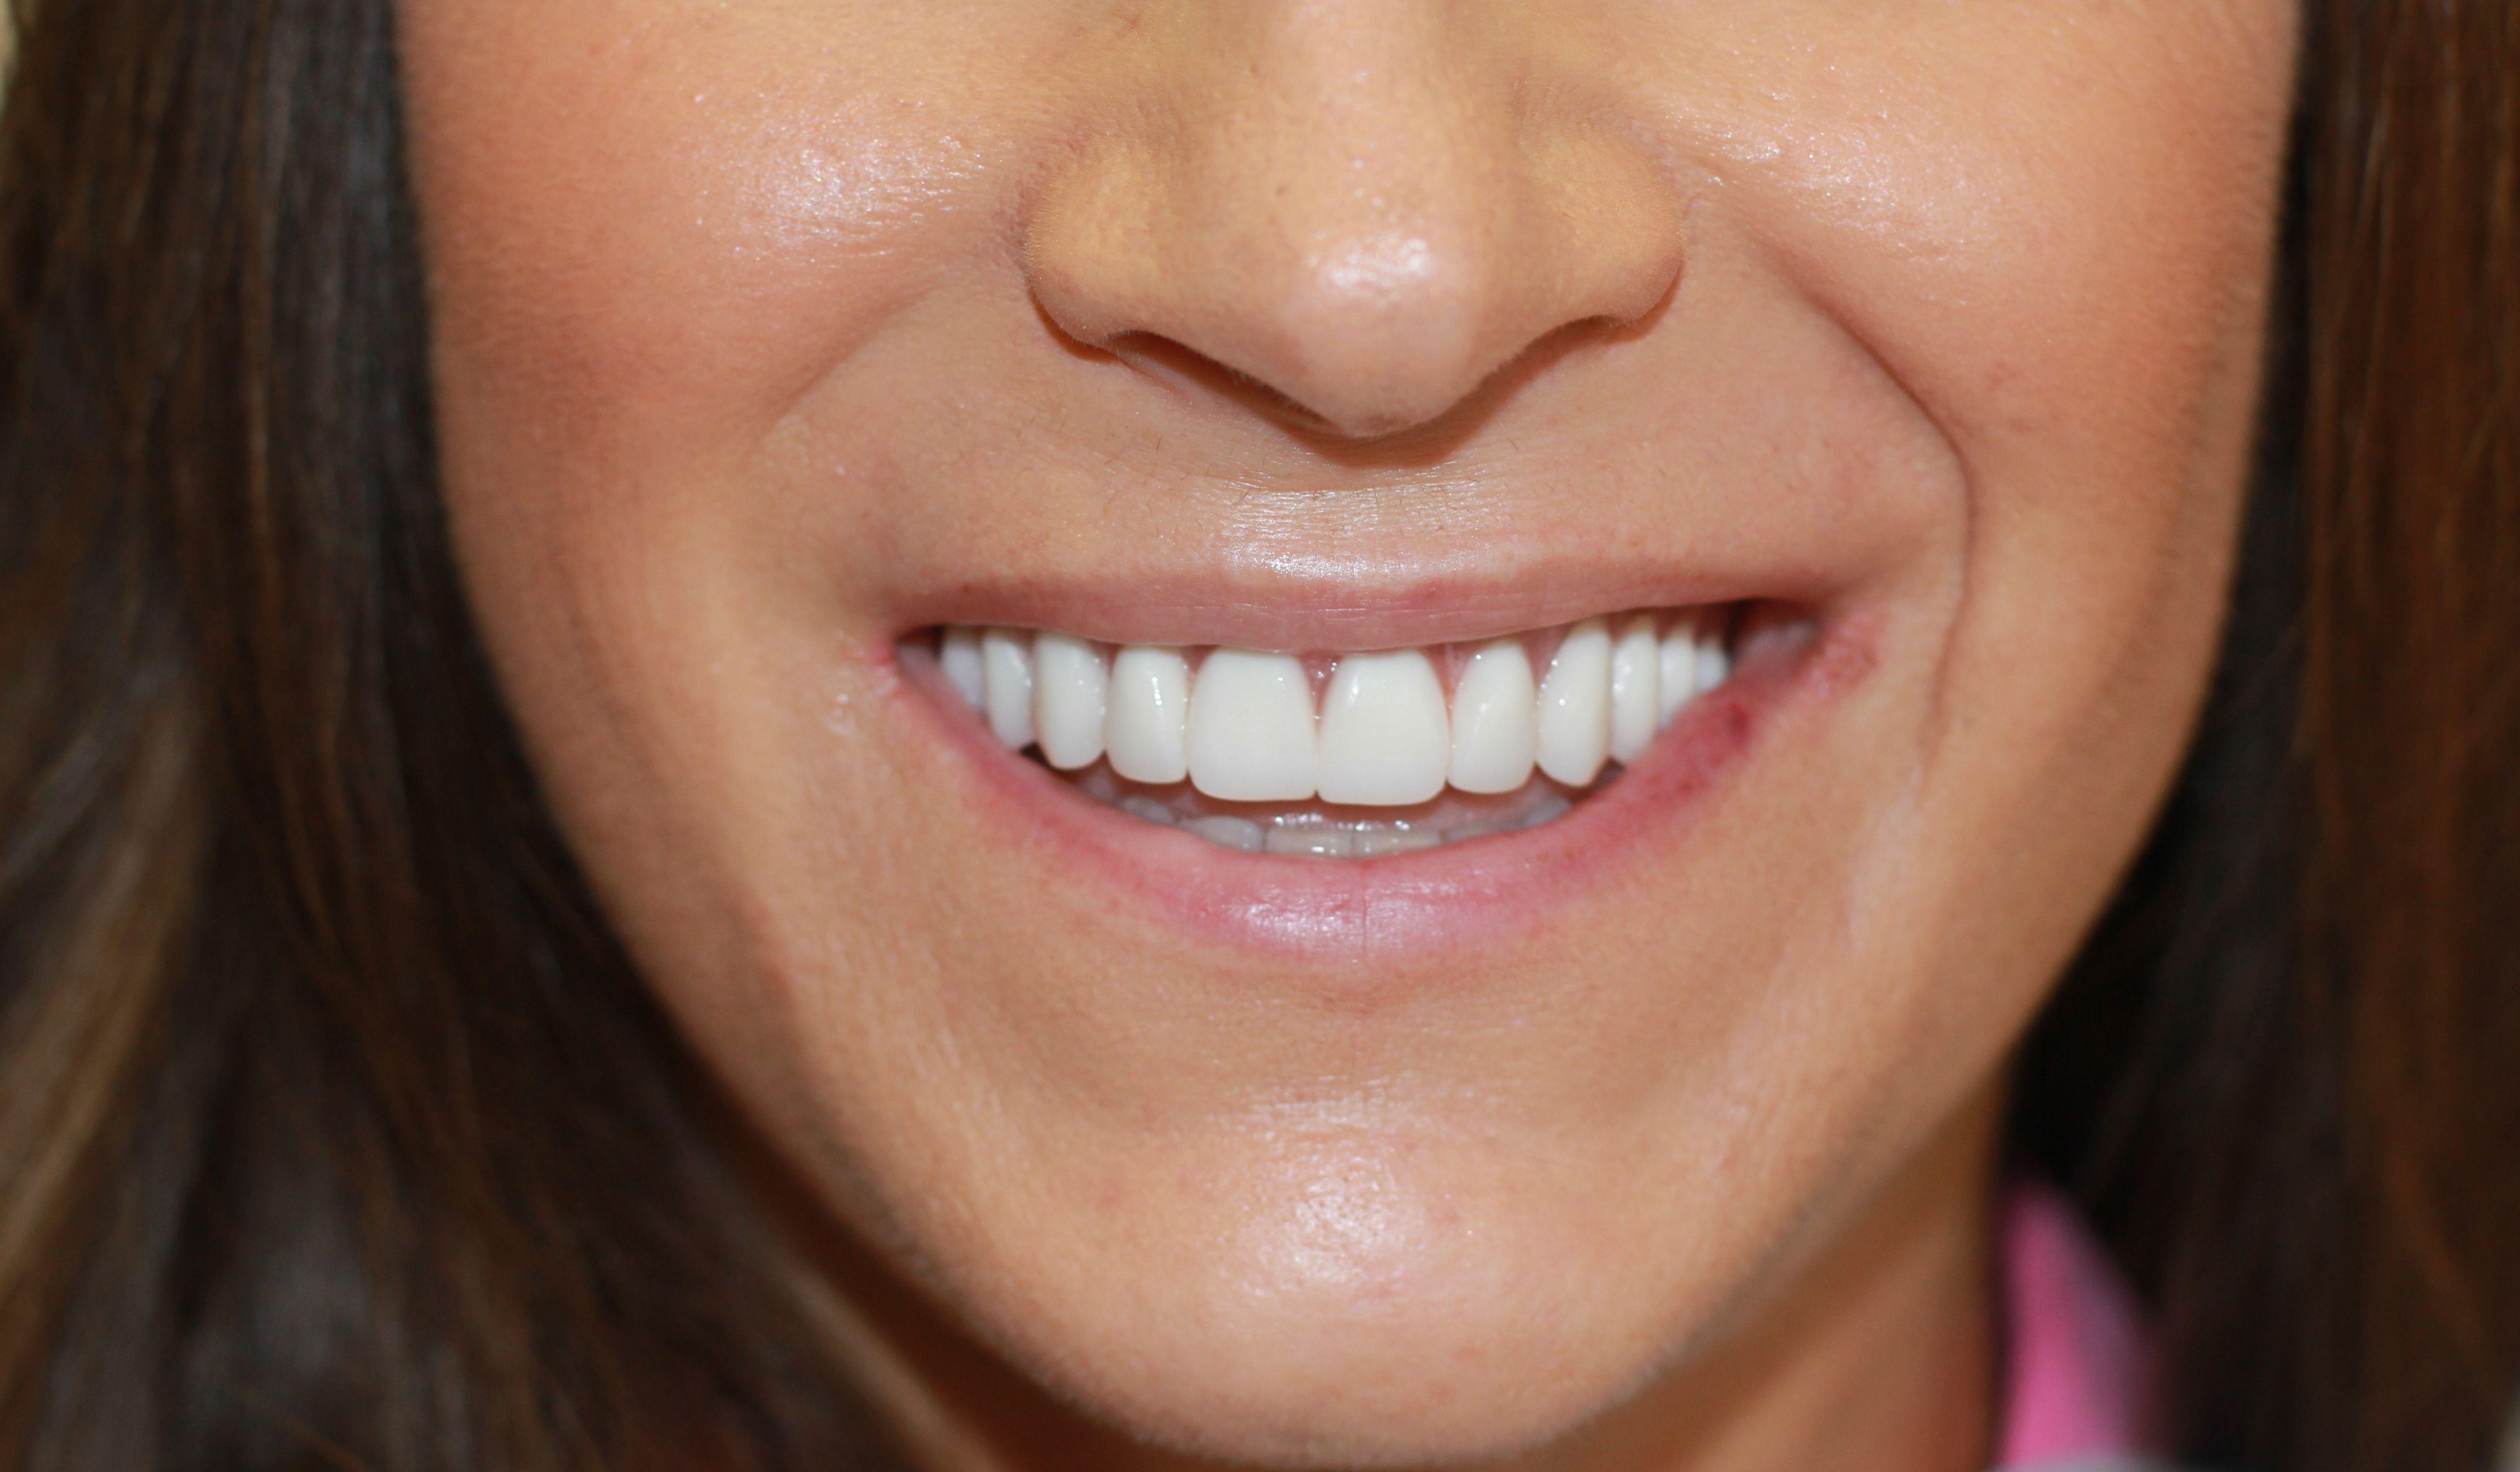 dr golpa dental implants http://golpa-dentalimplantcenter.com Dr. Golpa has been placing ...